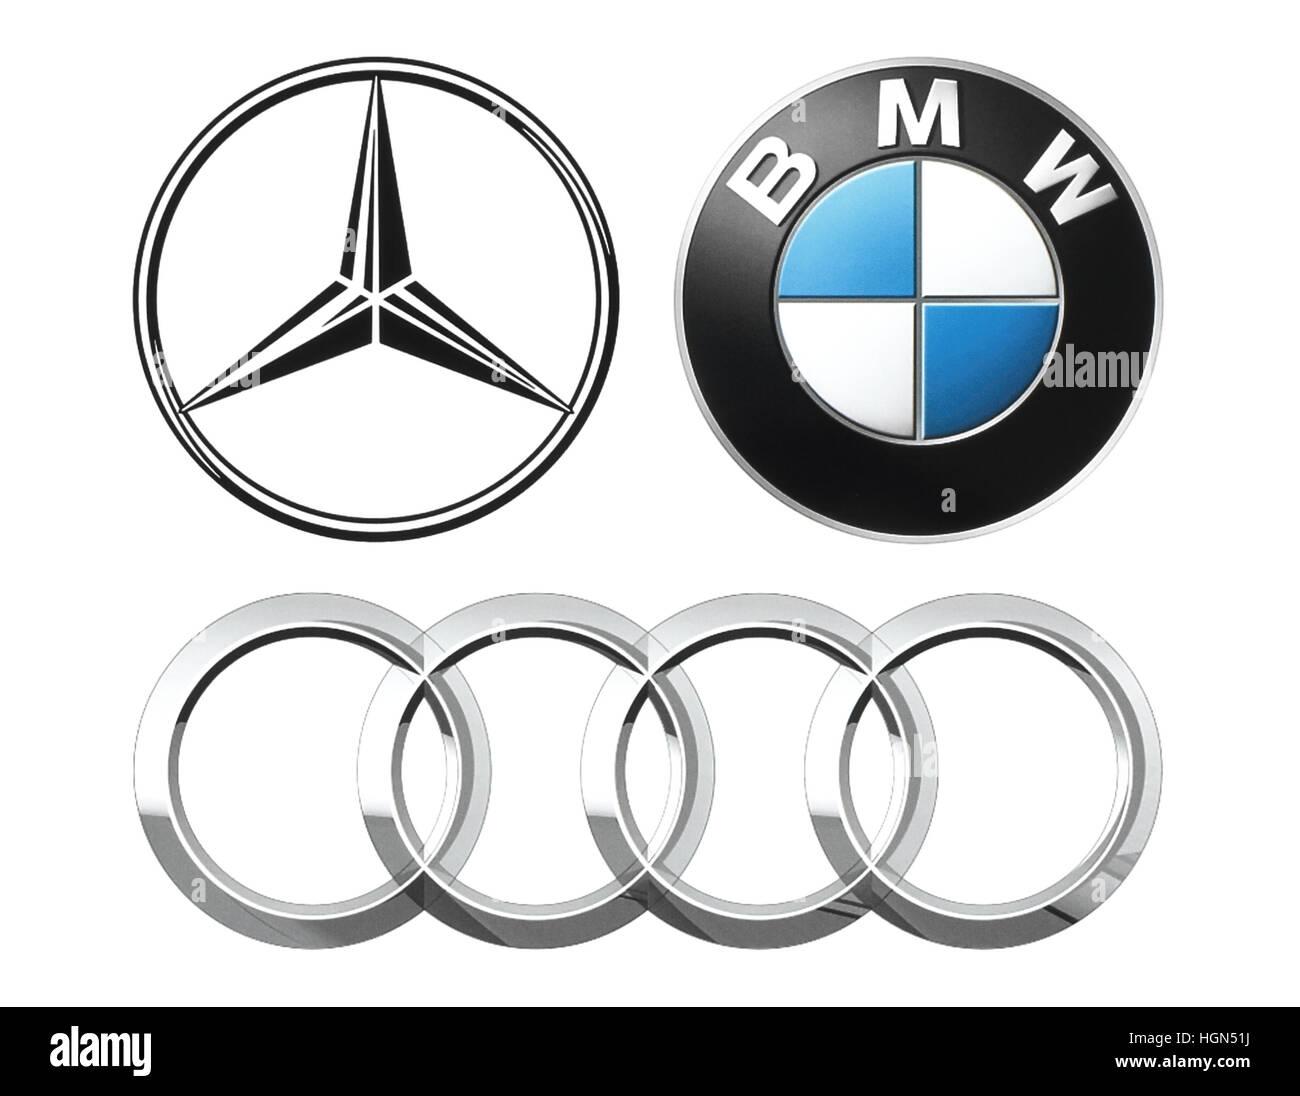 Kiev, Ukraine - September 12, 2016: Collection of popular German car logos printed on white paper: Mercedes, BMW - Stock Image